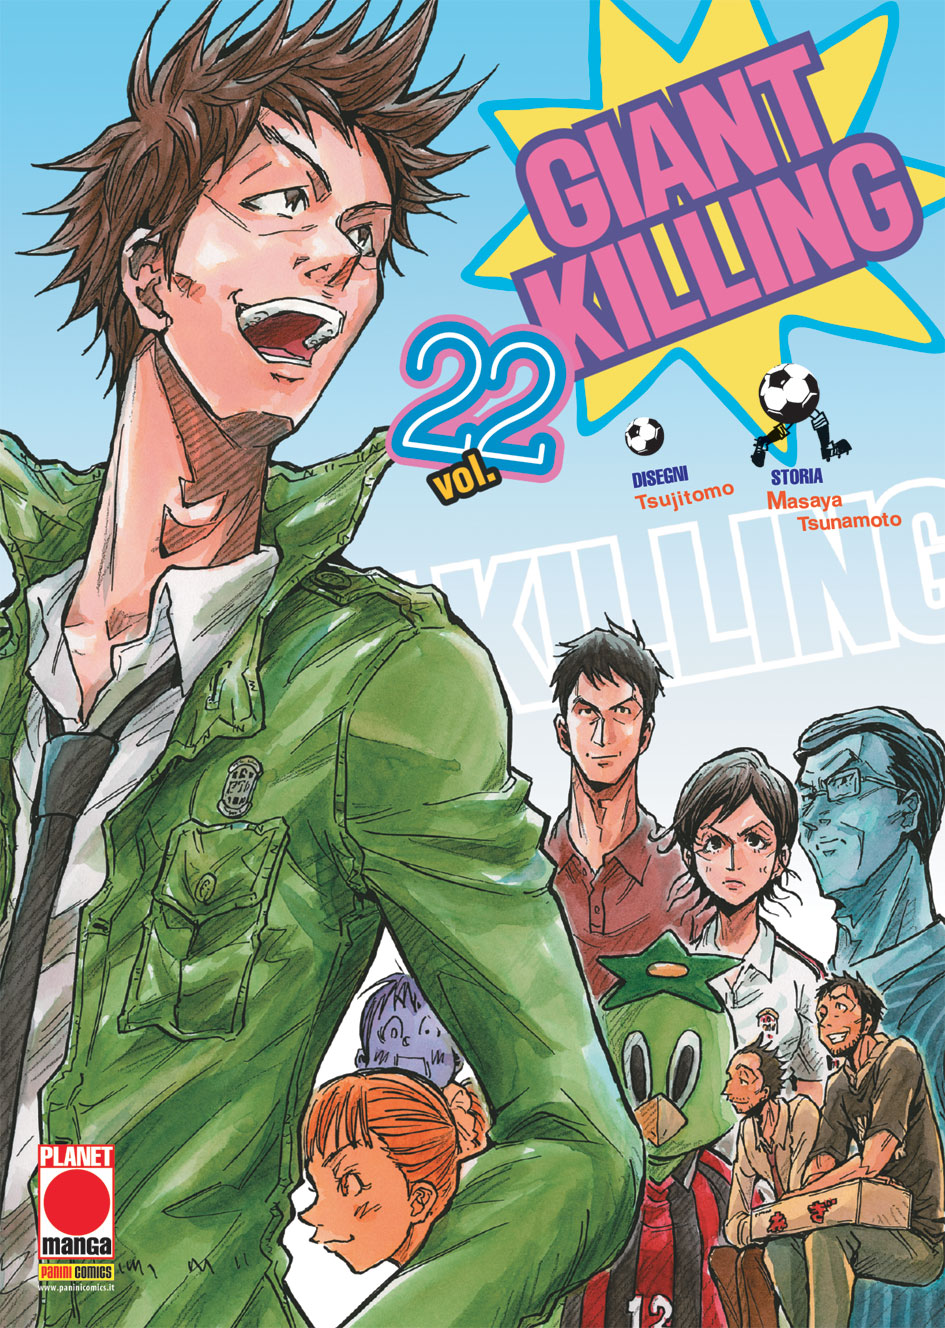 Giant Killing vol. 22